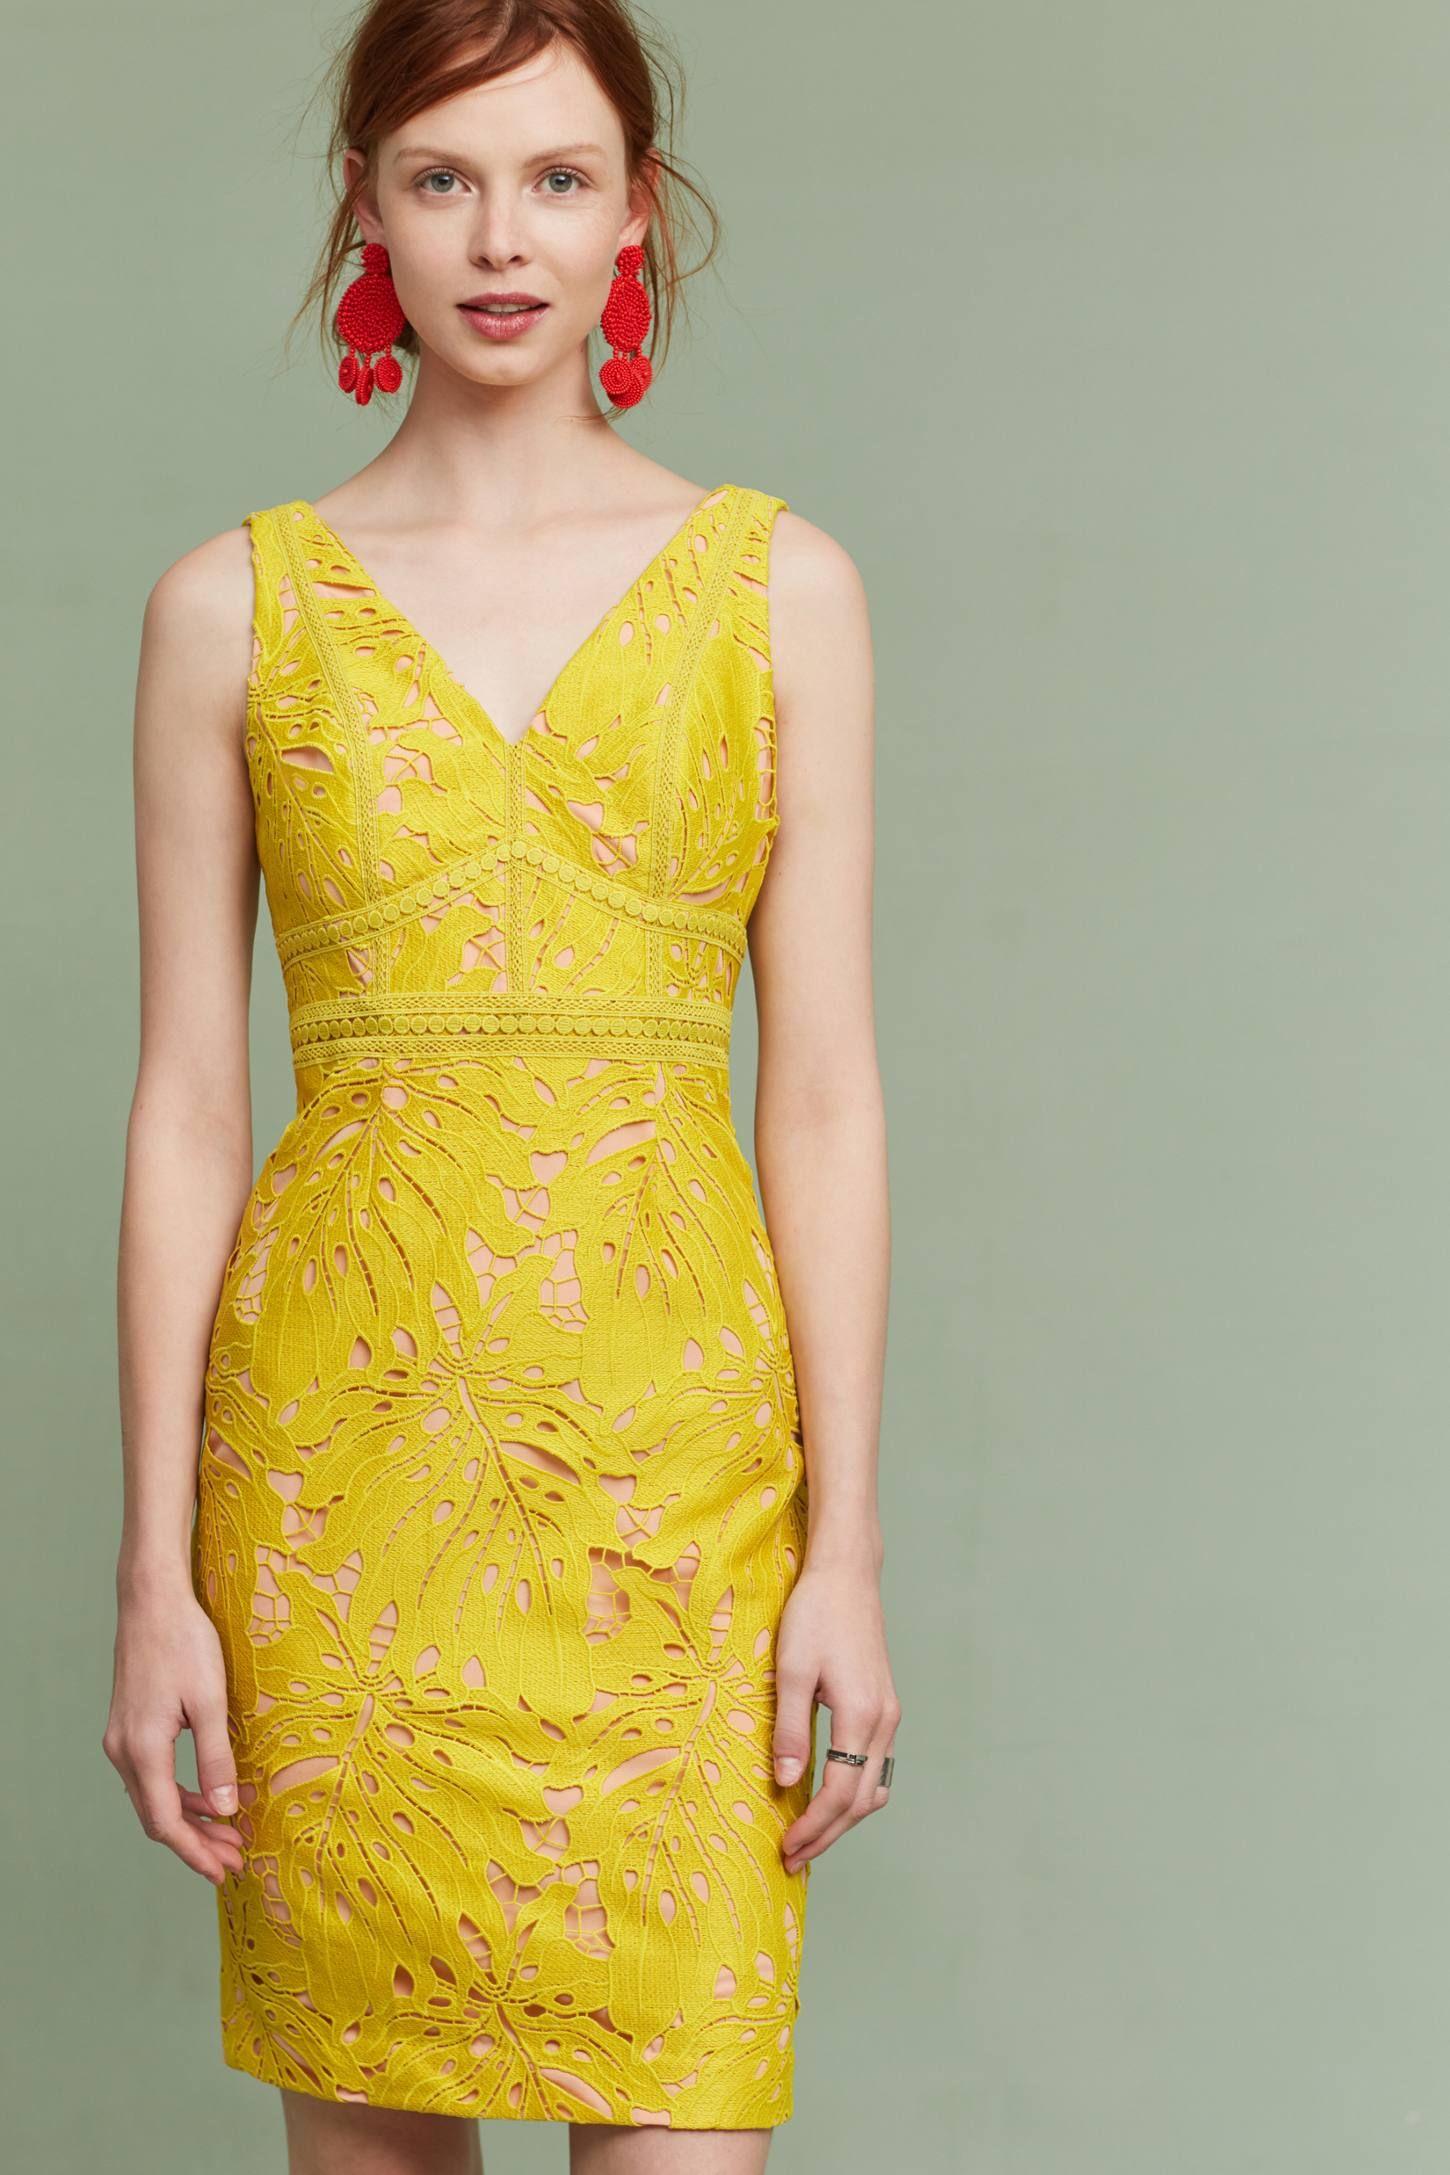 Slide view gardenia lace corset dress yellow clothes horse